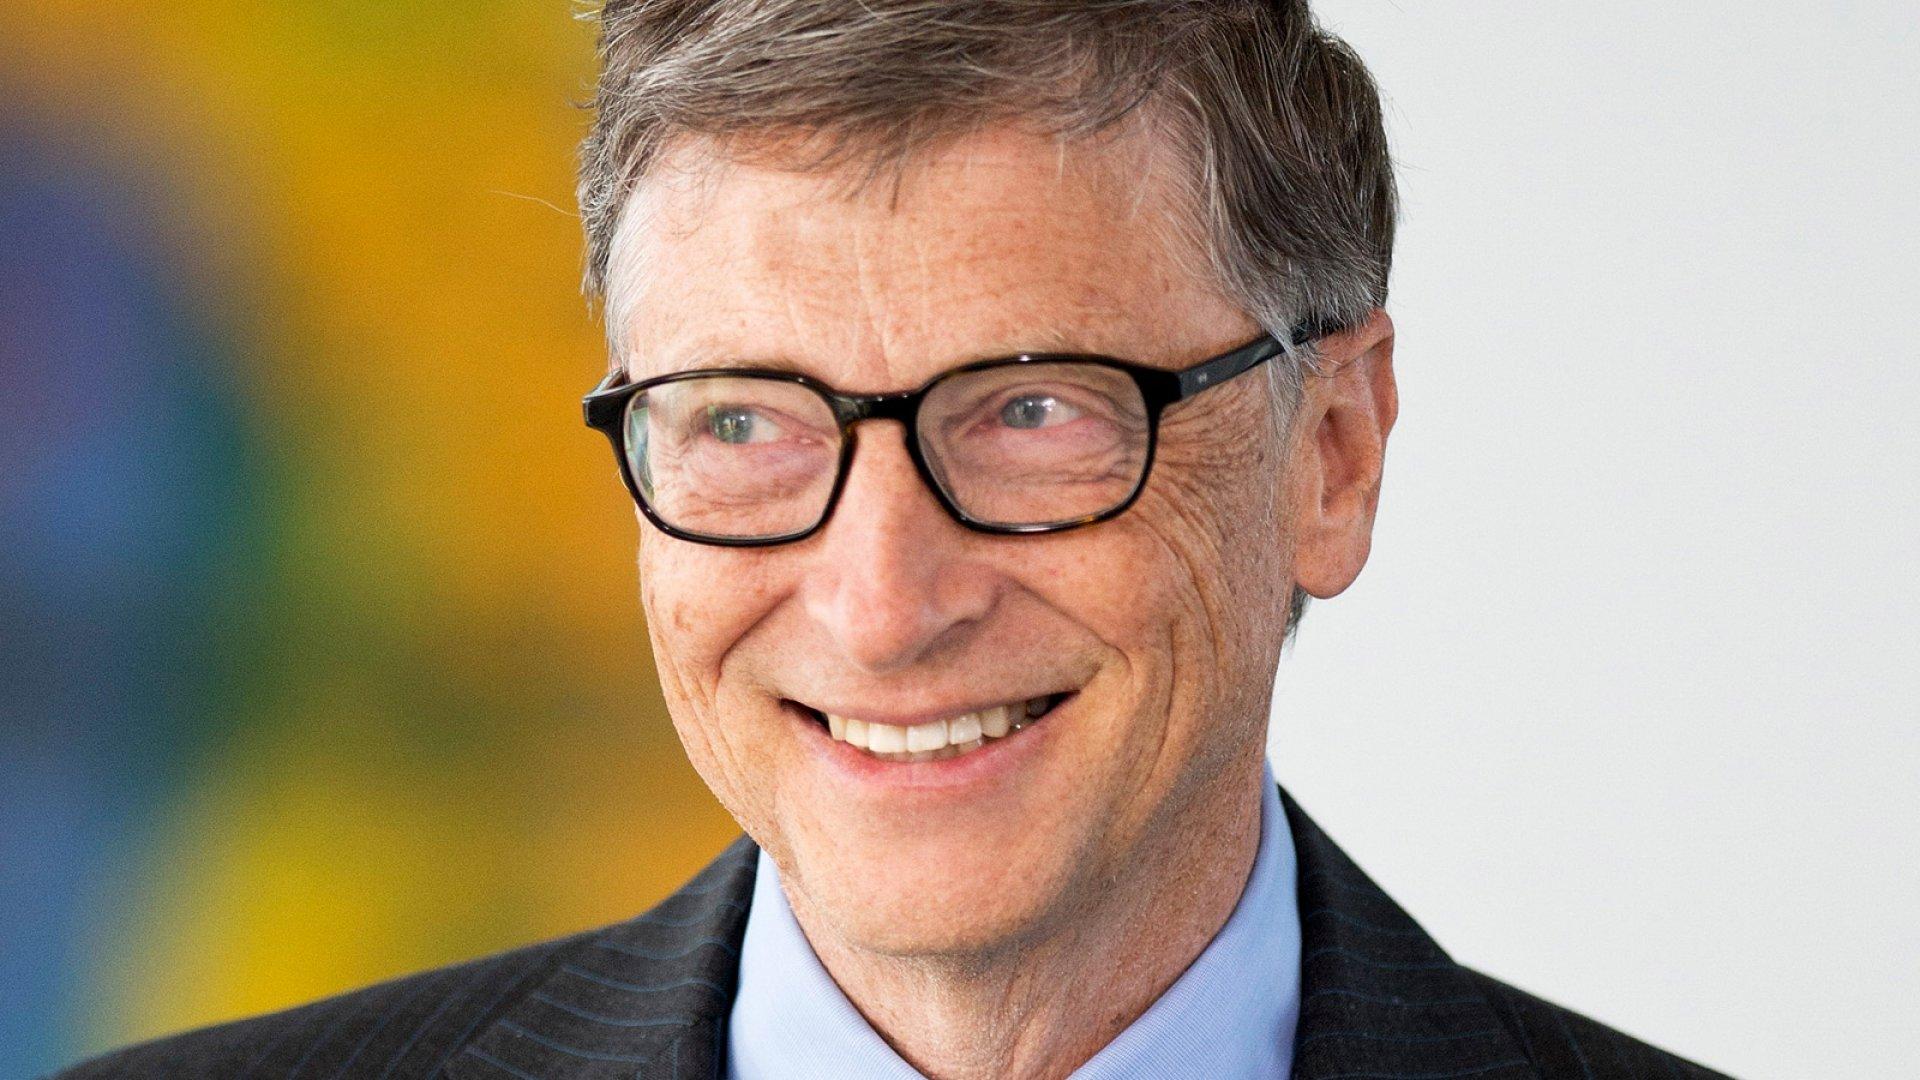 Bill Gates's Favorite Books of 2013